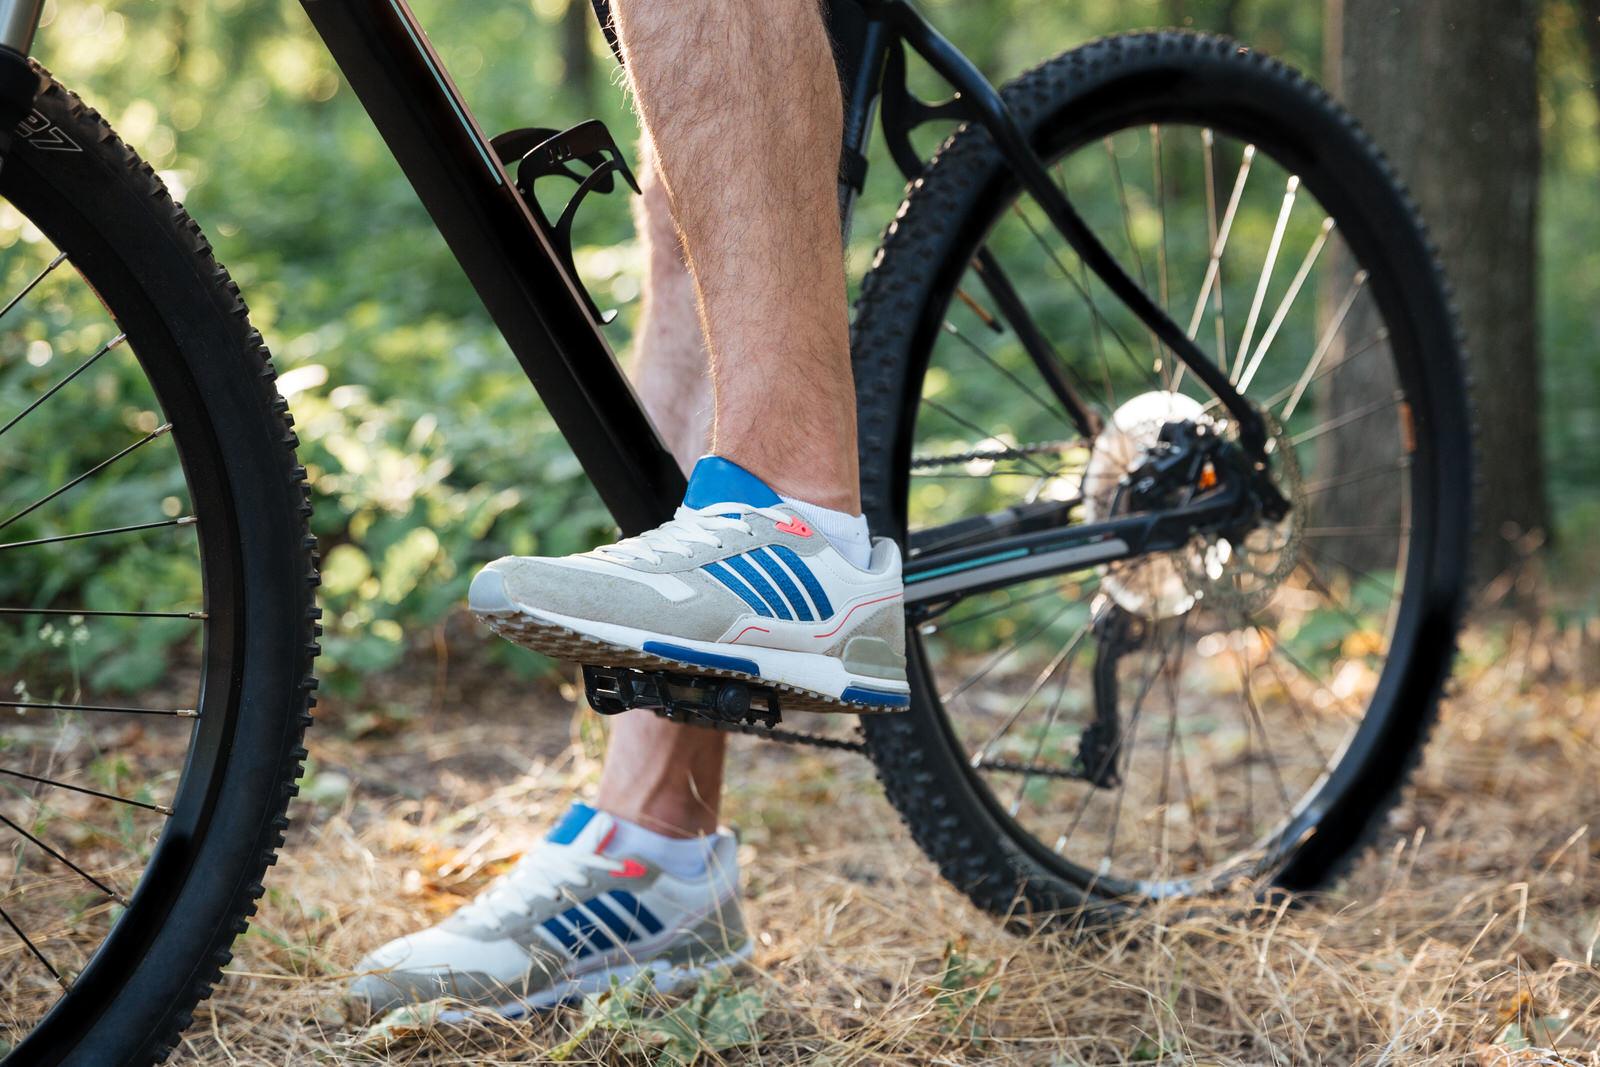 Somerset Bike Hire